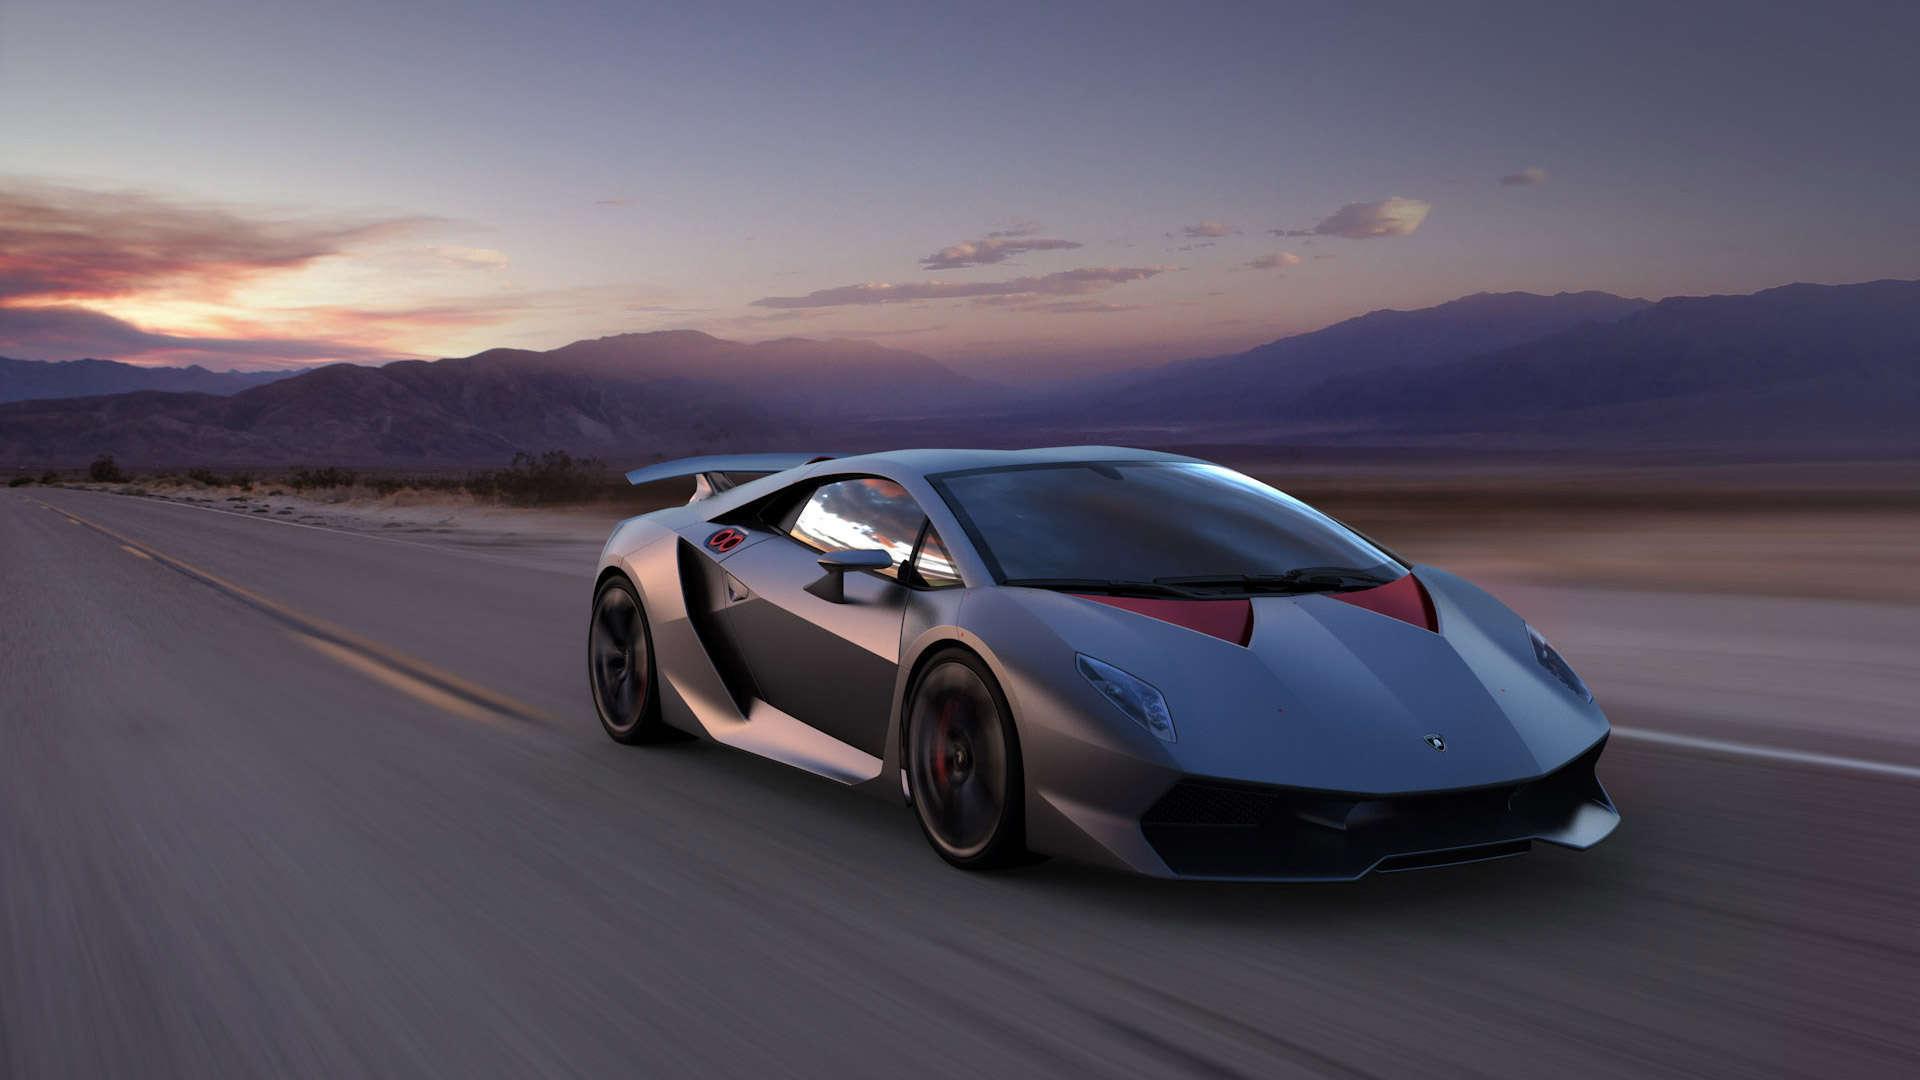 Wallpaper Lamborghini Sesto Elemento HD Wallpaper 1080p Upload at 1920x1080